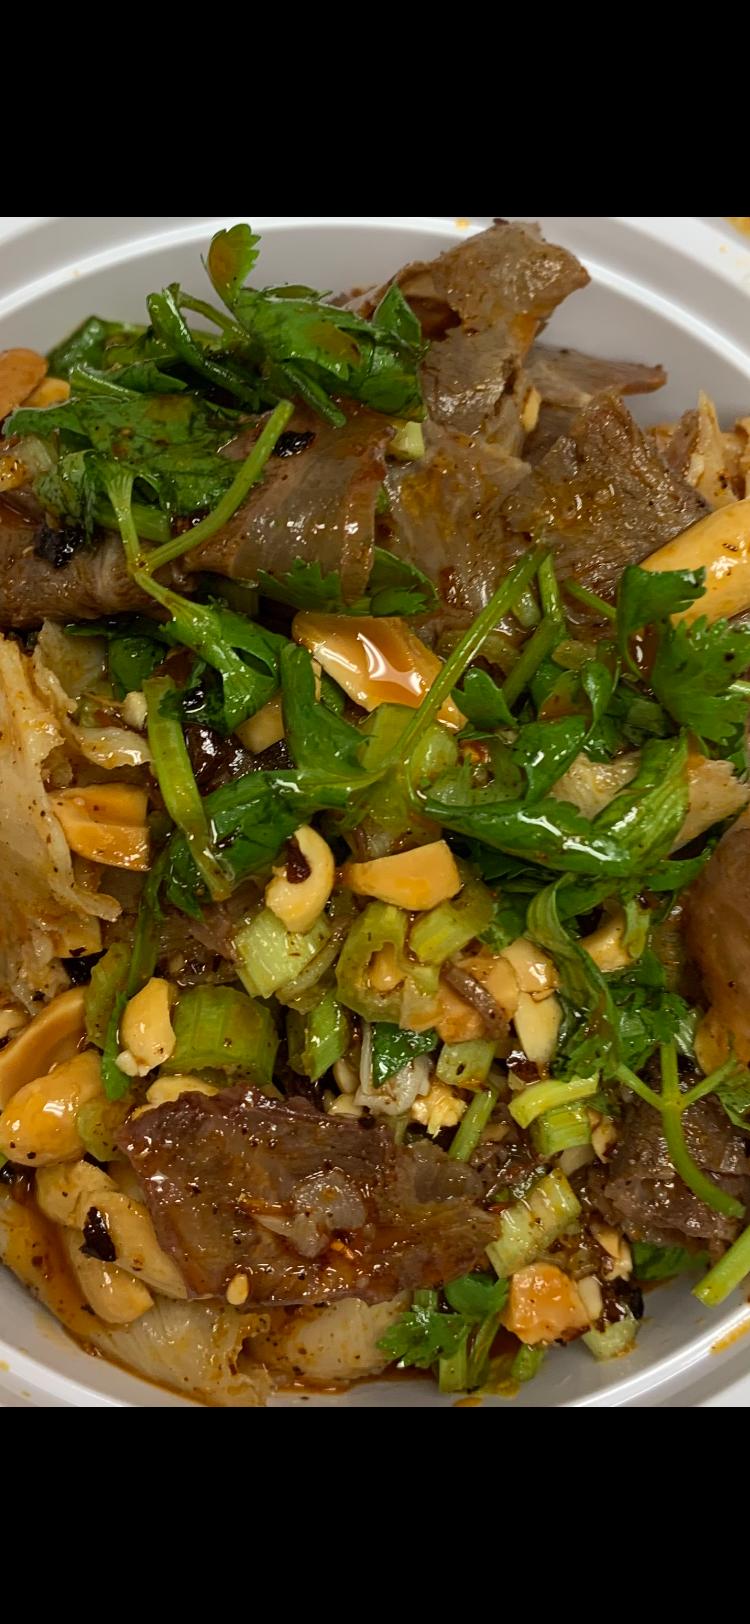 1. Beef Triple Tongue in Chili Oil (Cold) 夫妻肺片